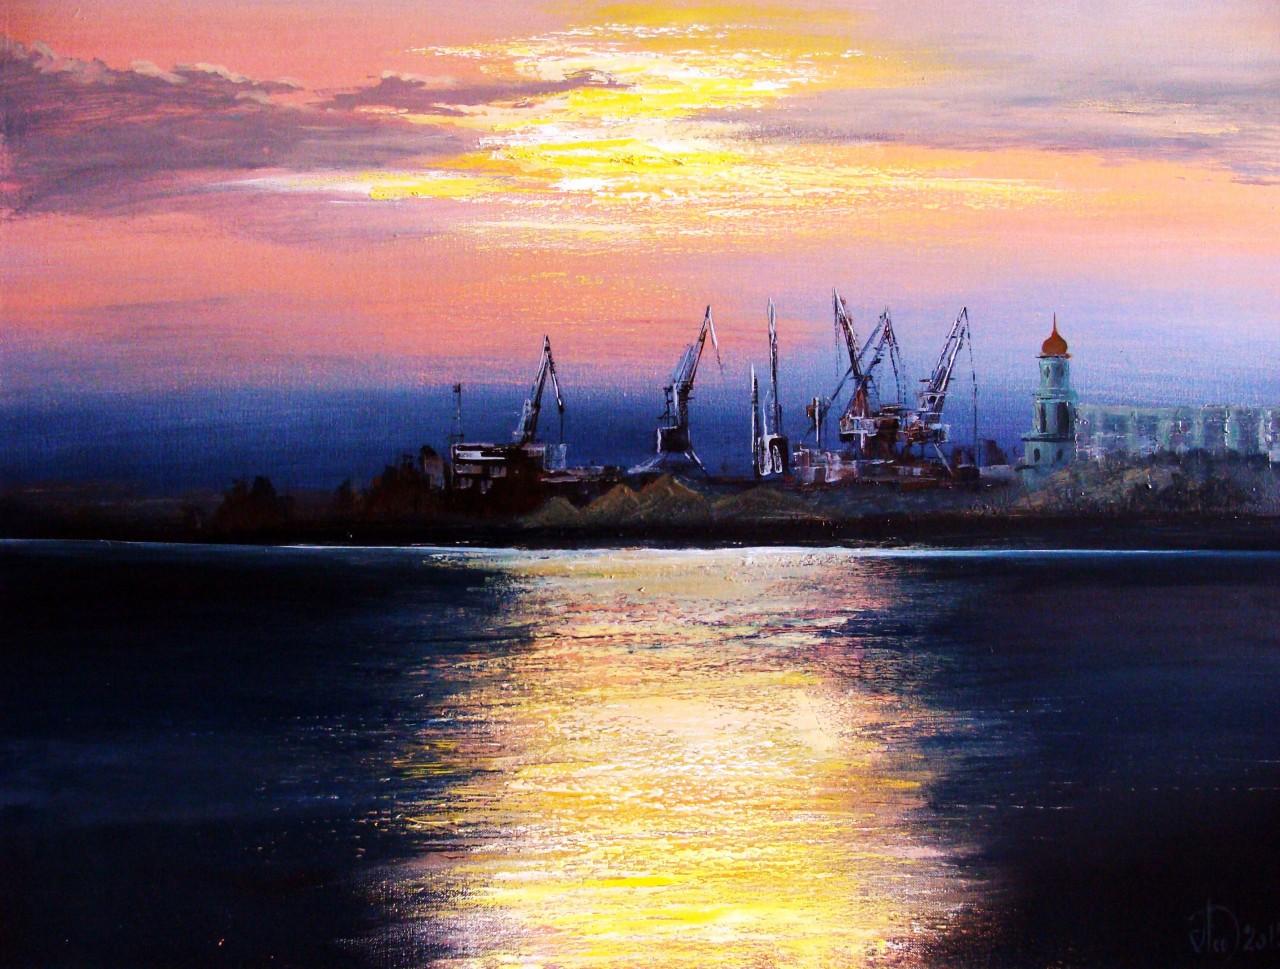 Вечерний порт   Живопись   Автор ...: dotart.info/ru/art/work=629